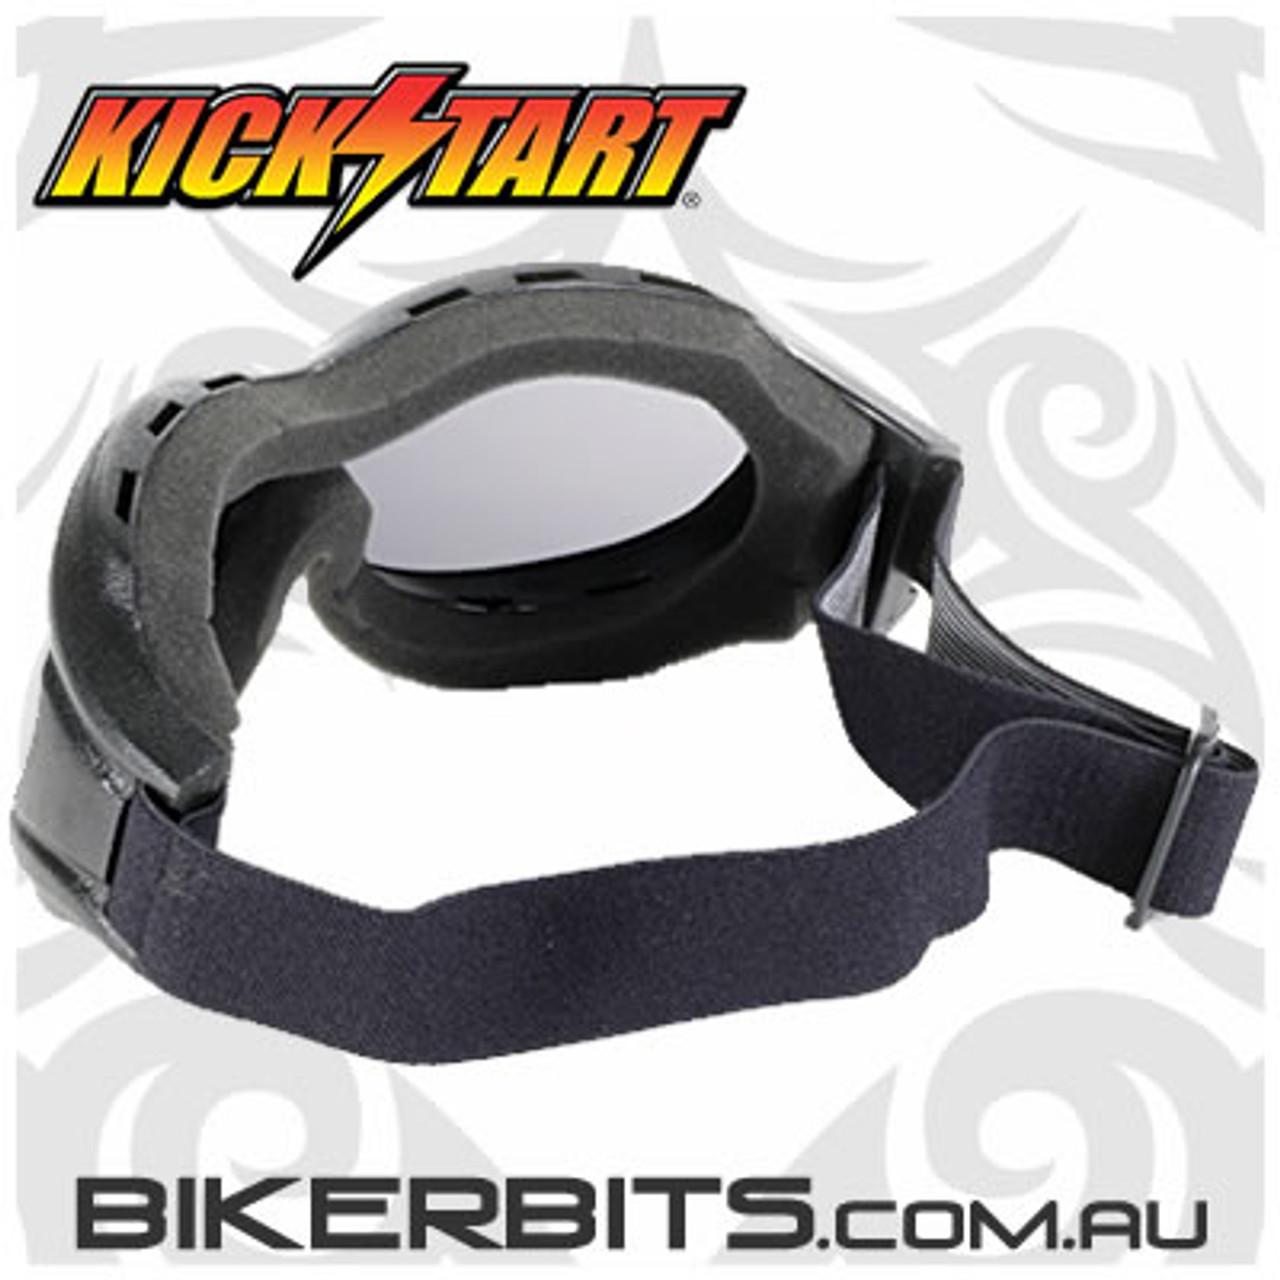 Motorcycle Goggles - Kickstart Beast- Smoke/Black